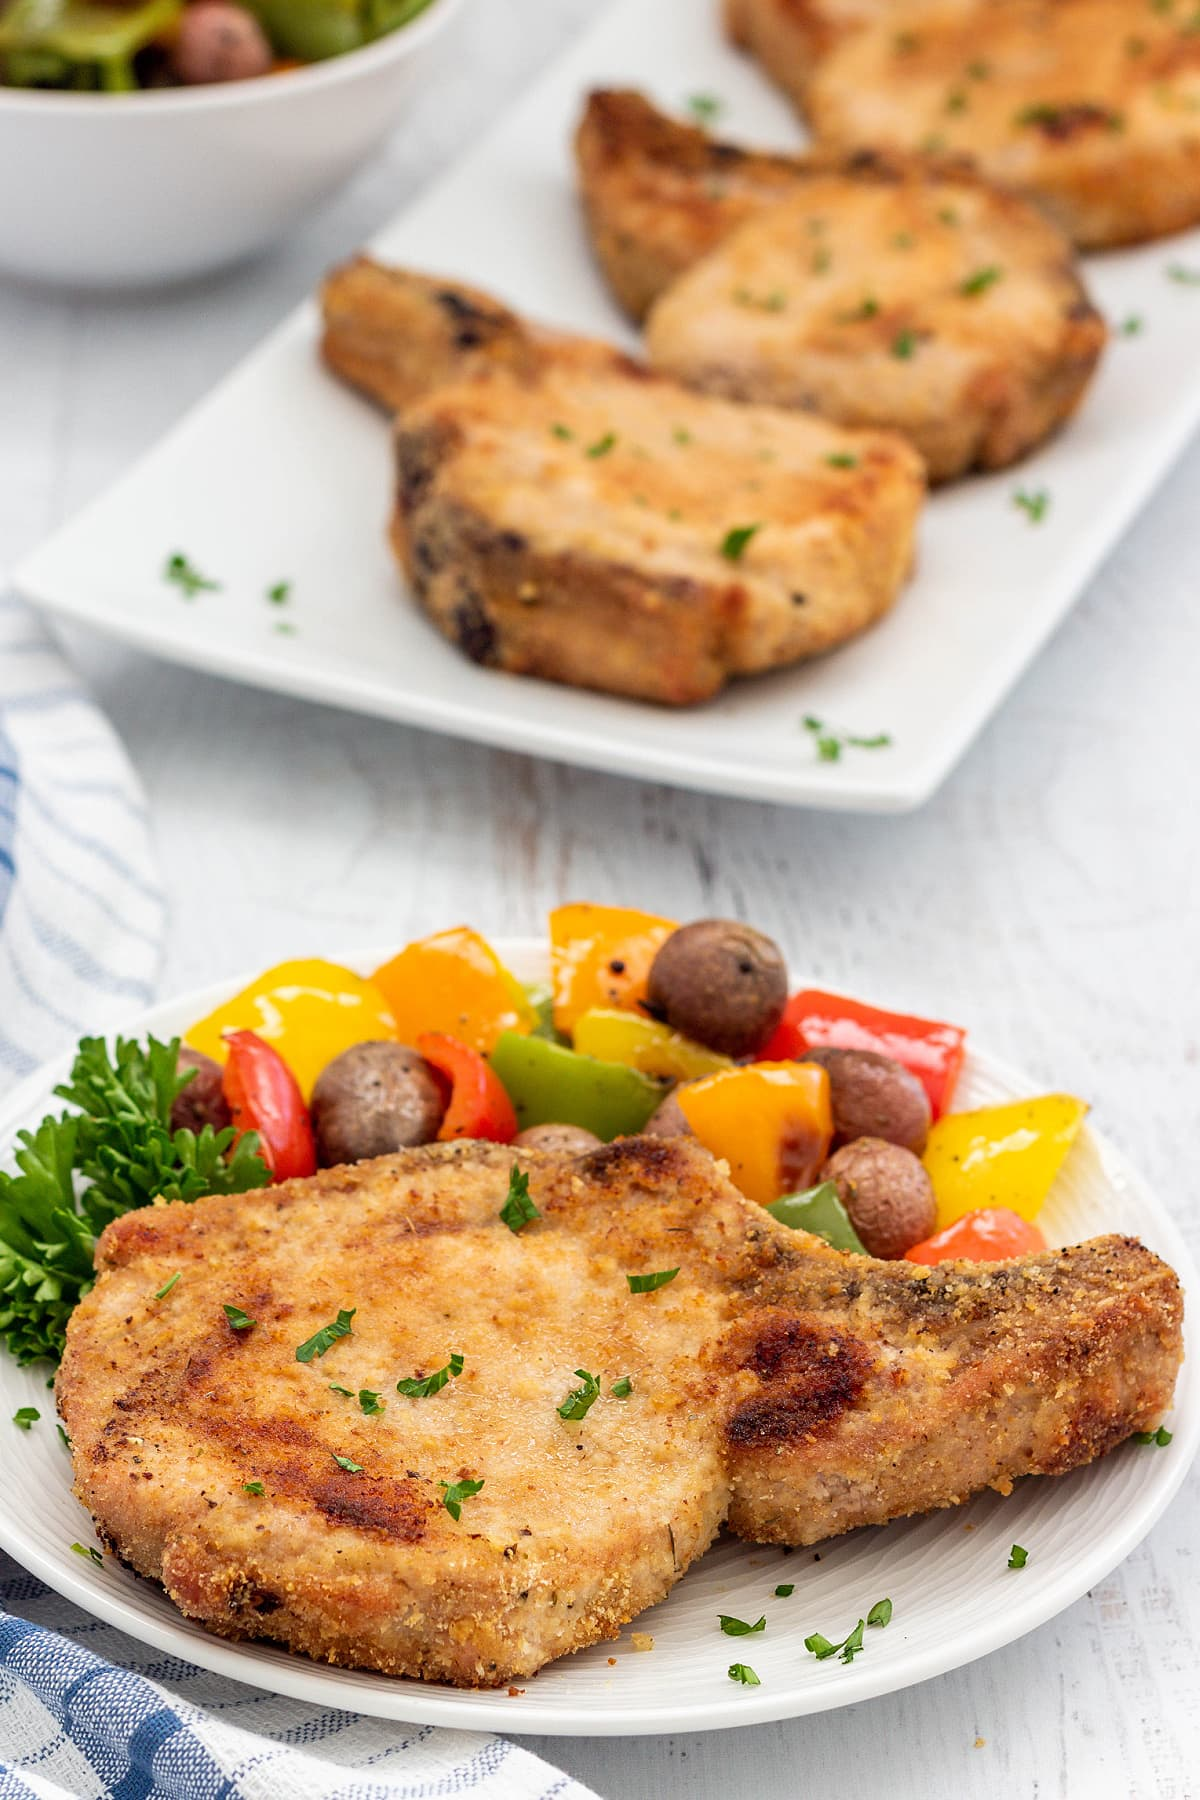 Shake and bake pork chop on a plate